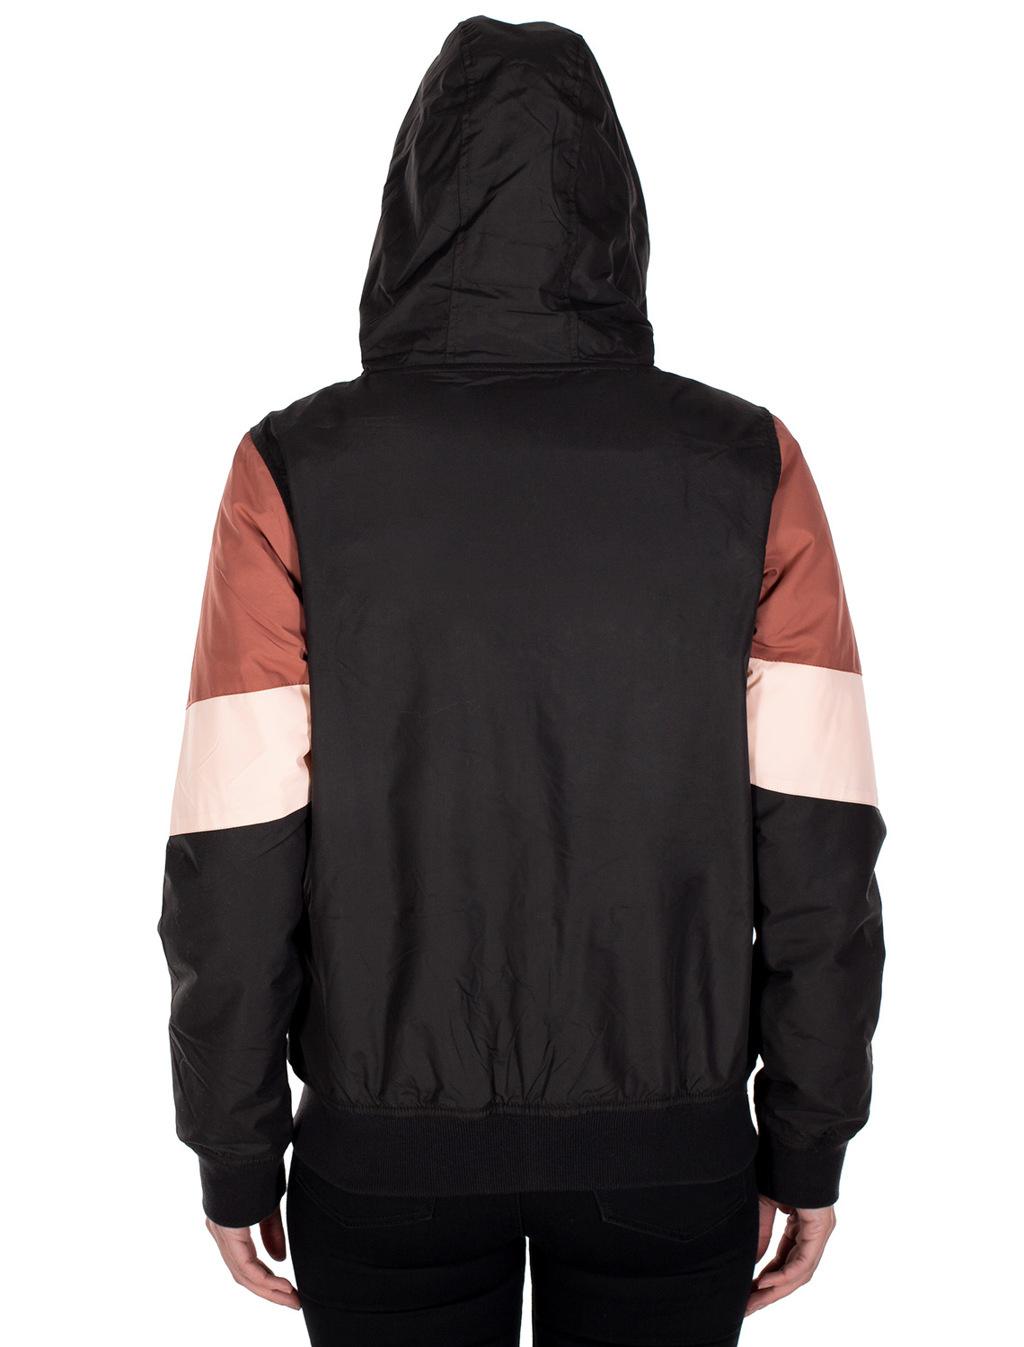 Blotchy Jacket - Black rose-3